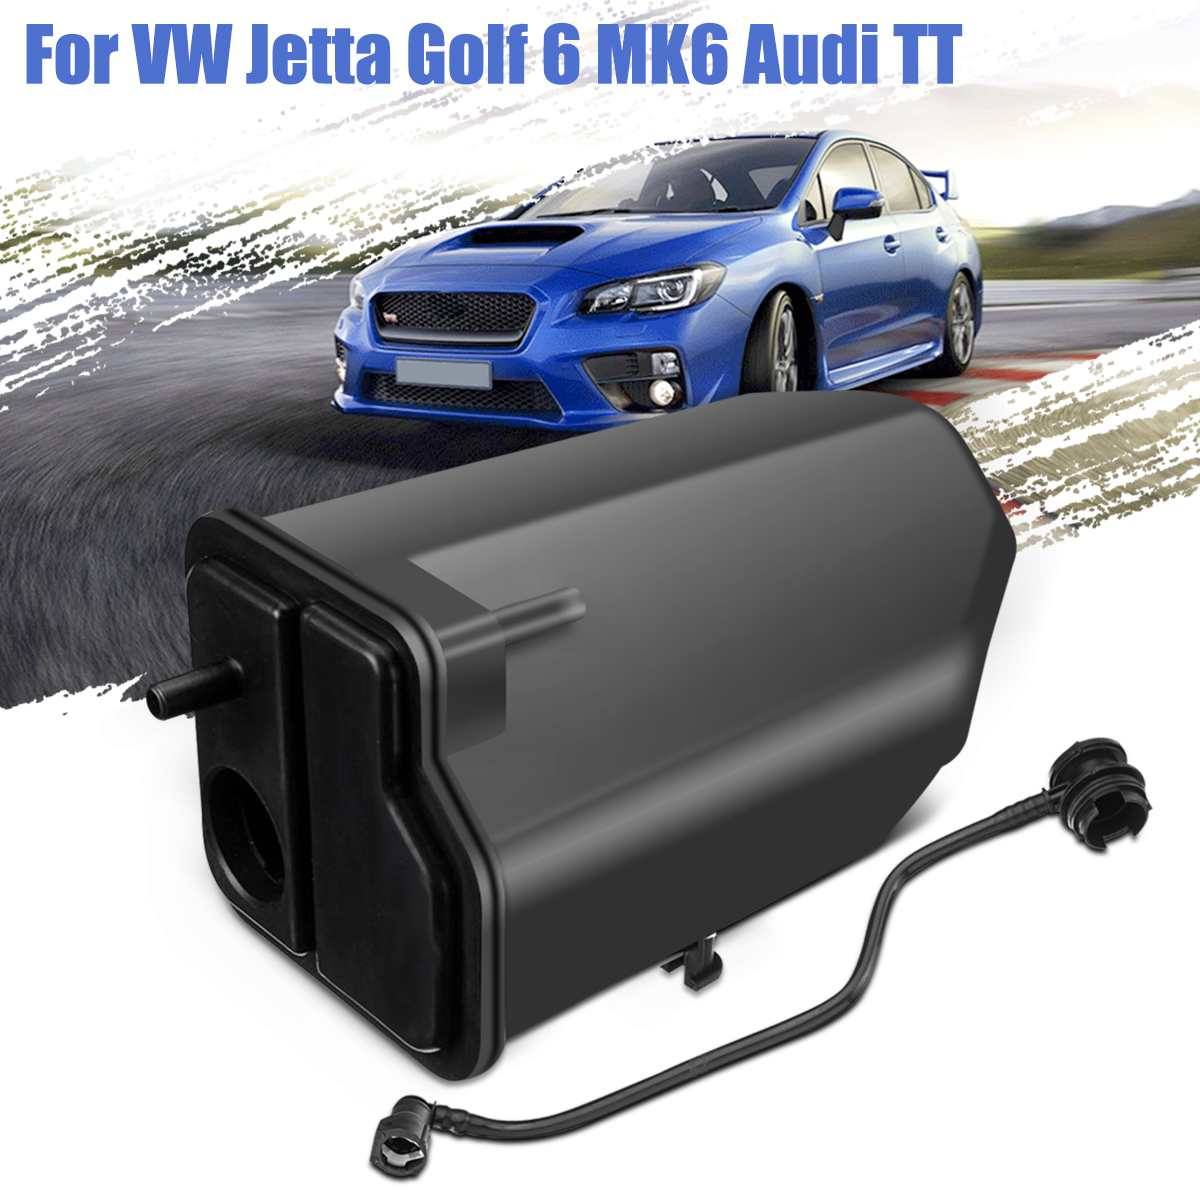 1k0201897ae 1k0201801e 아우디 a3 tt 용 vw/제타 골프 eos 용 자동차 활성탄 숯 용기 캔의 My Car Store